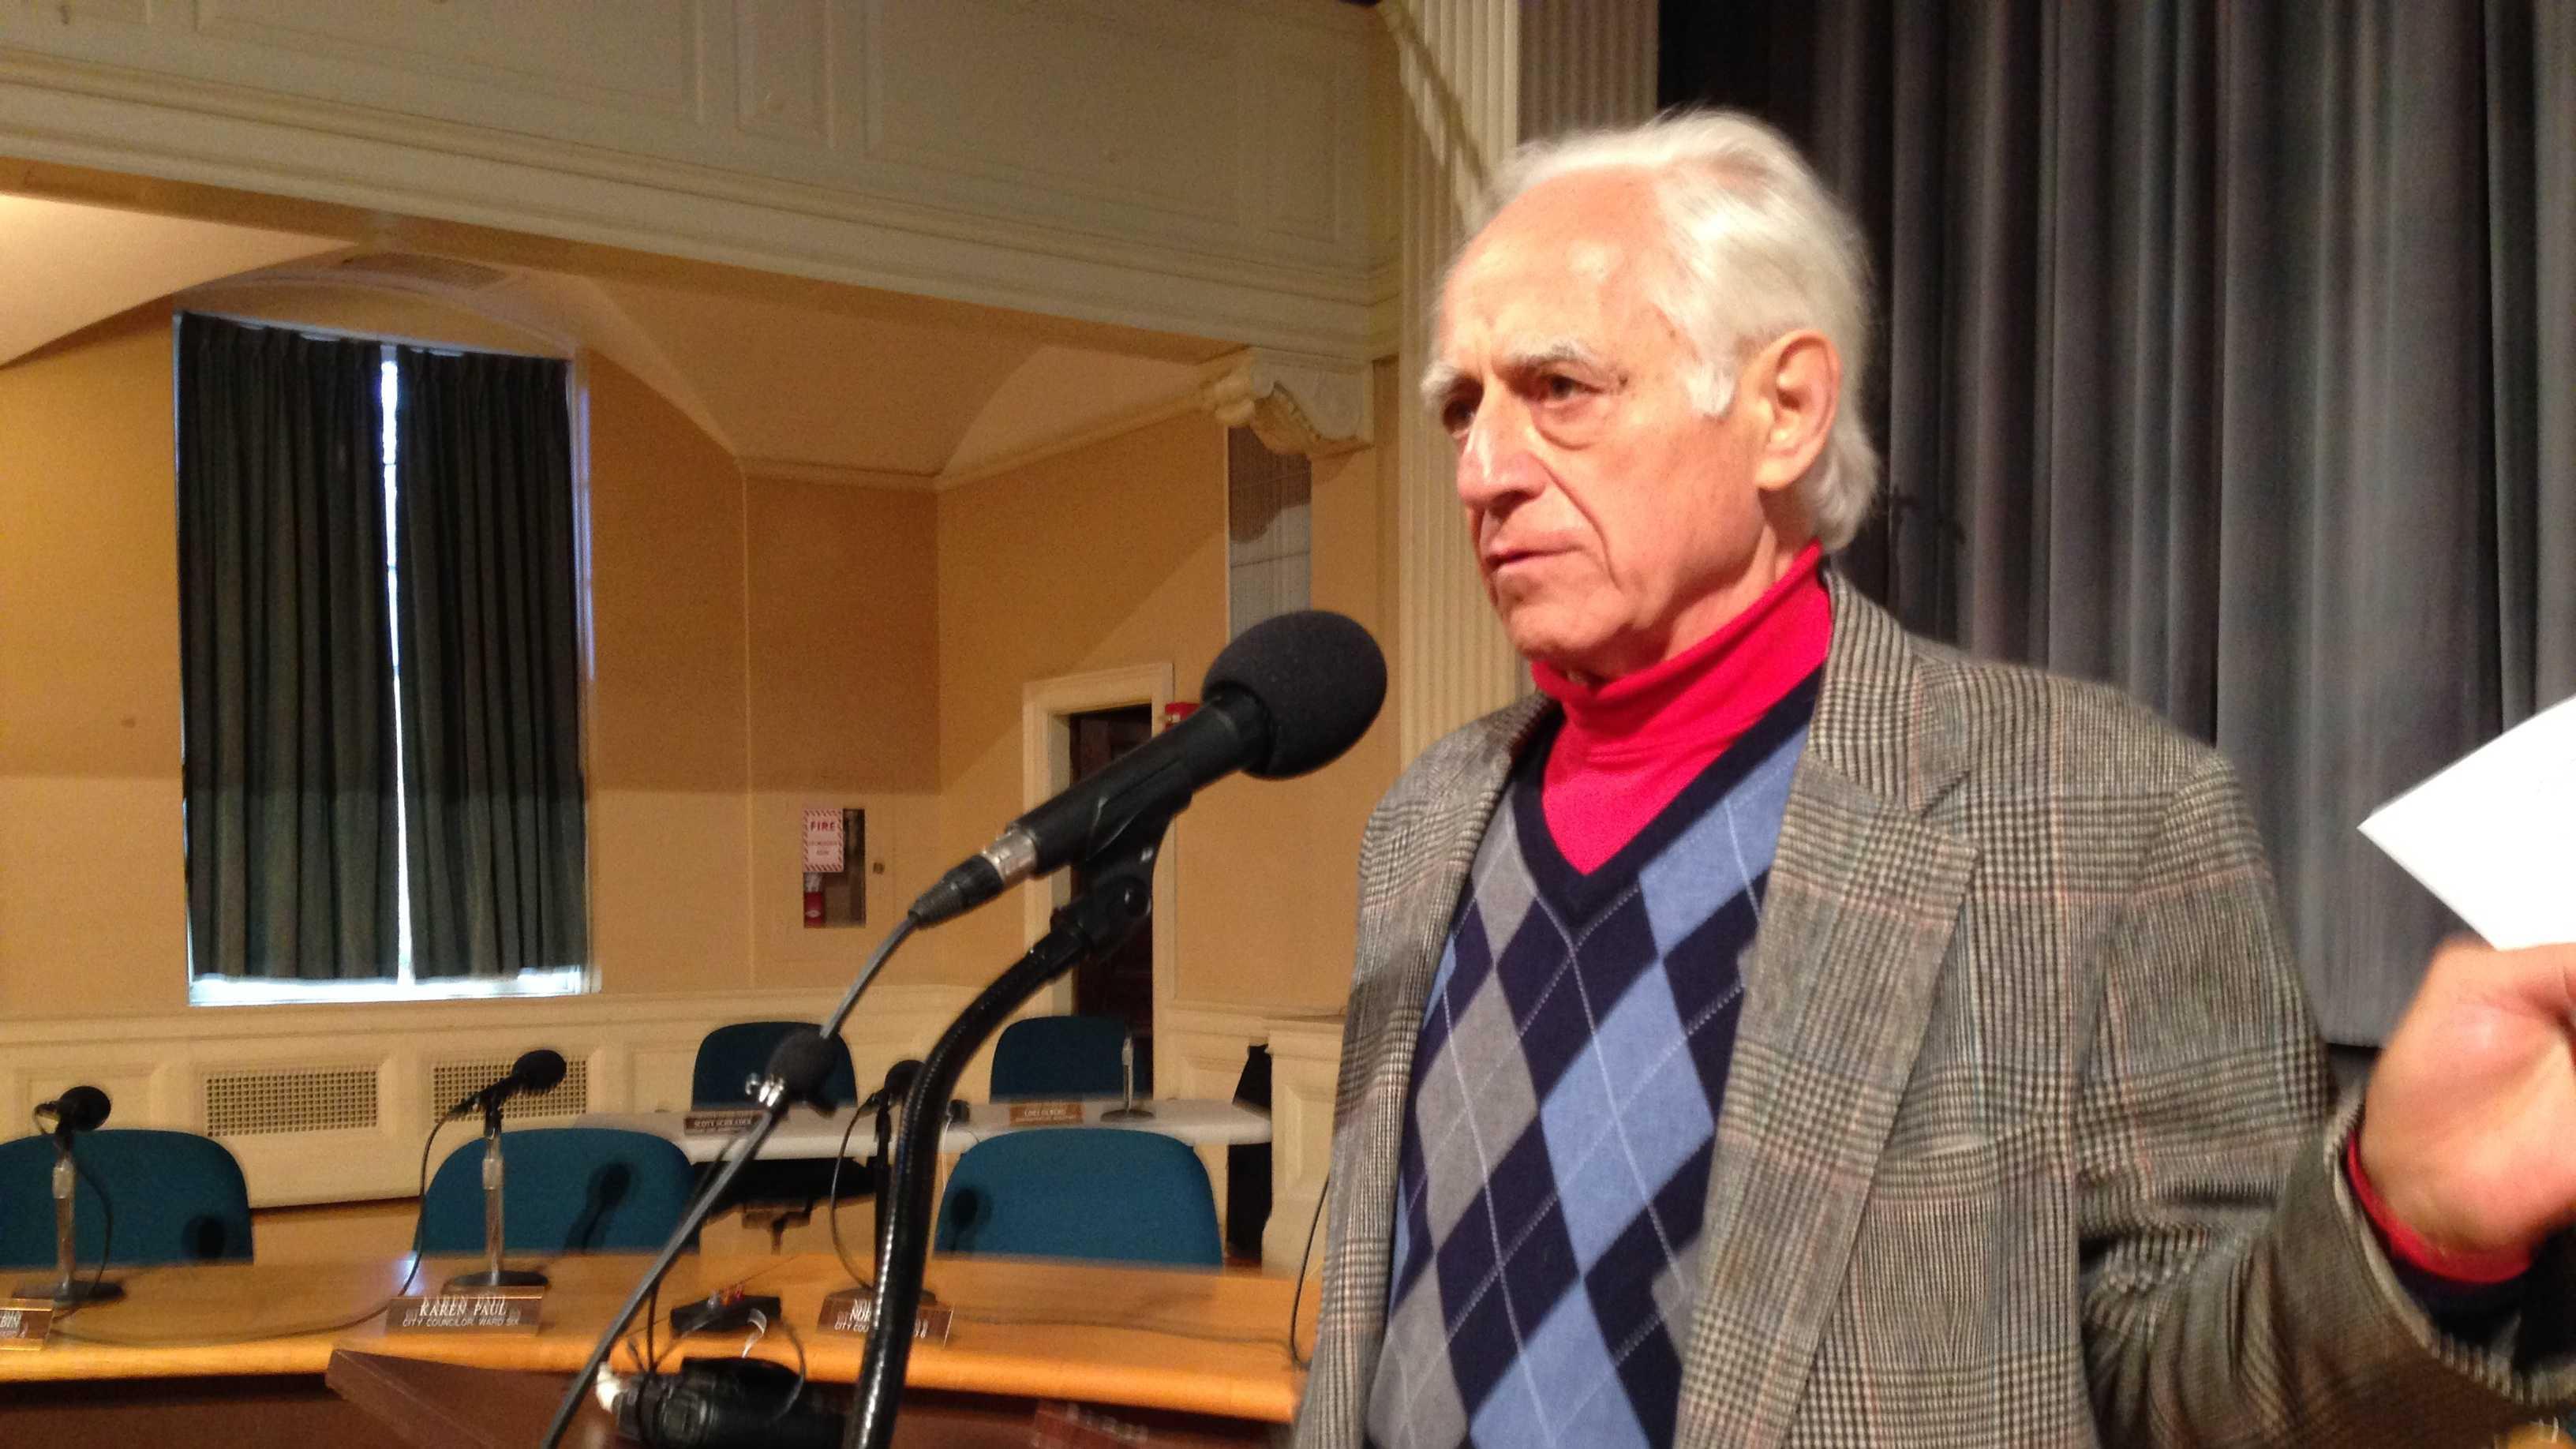 Pierre Sprey, speaking at Burlington City Hall Wednesday.